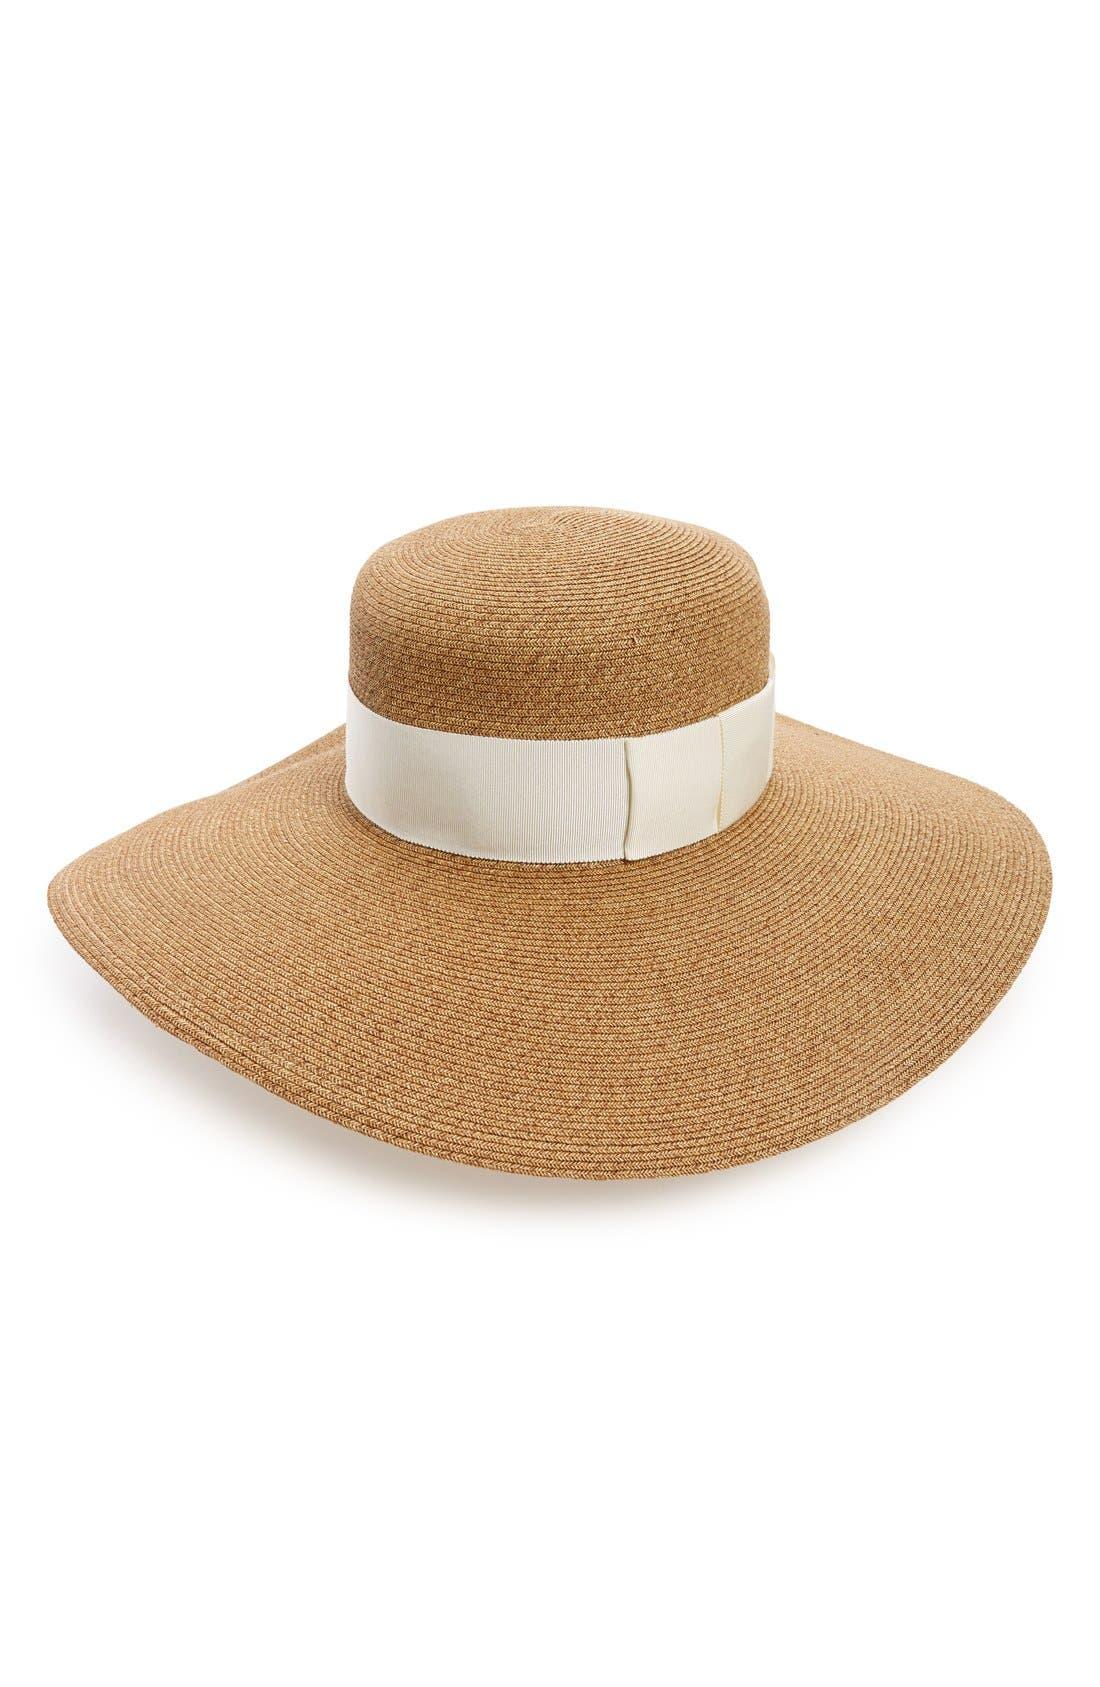 Main Image - Eugenina Kim Straw Sun Hat